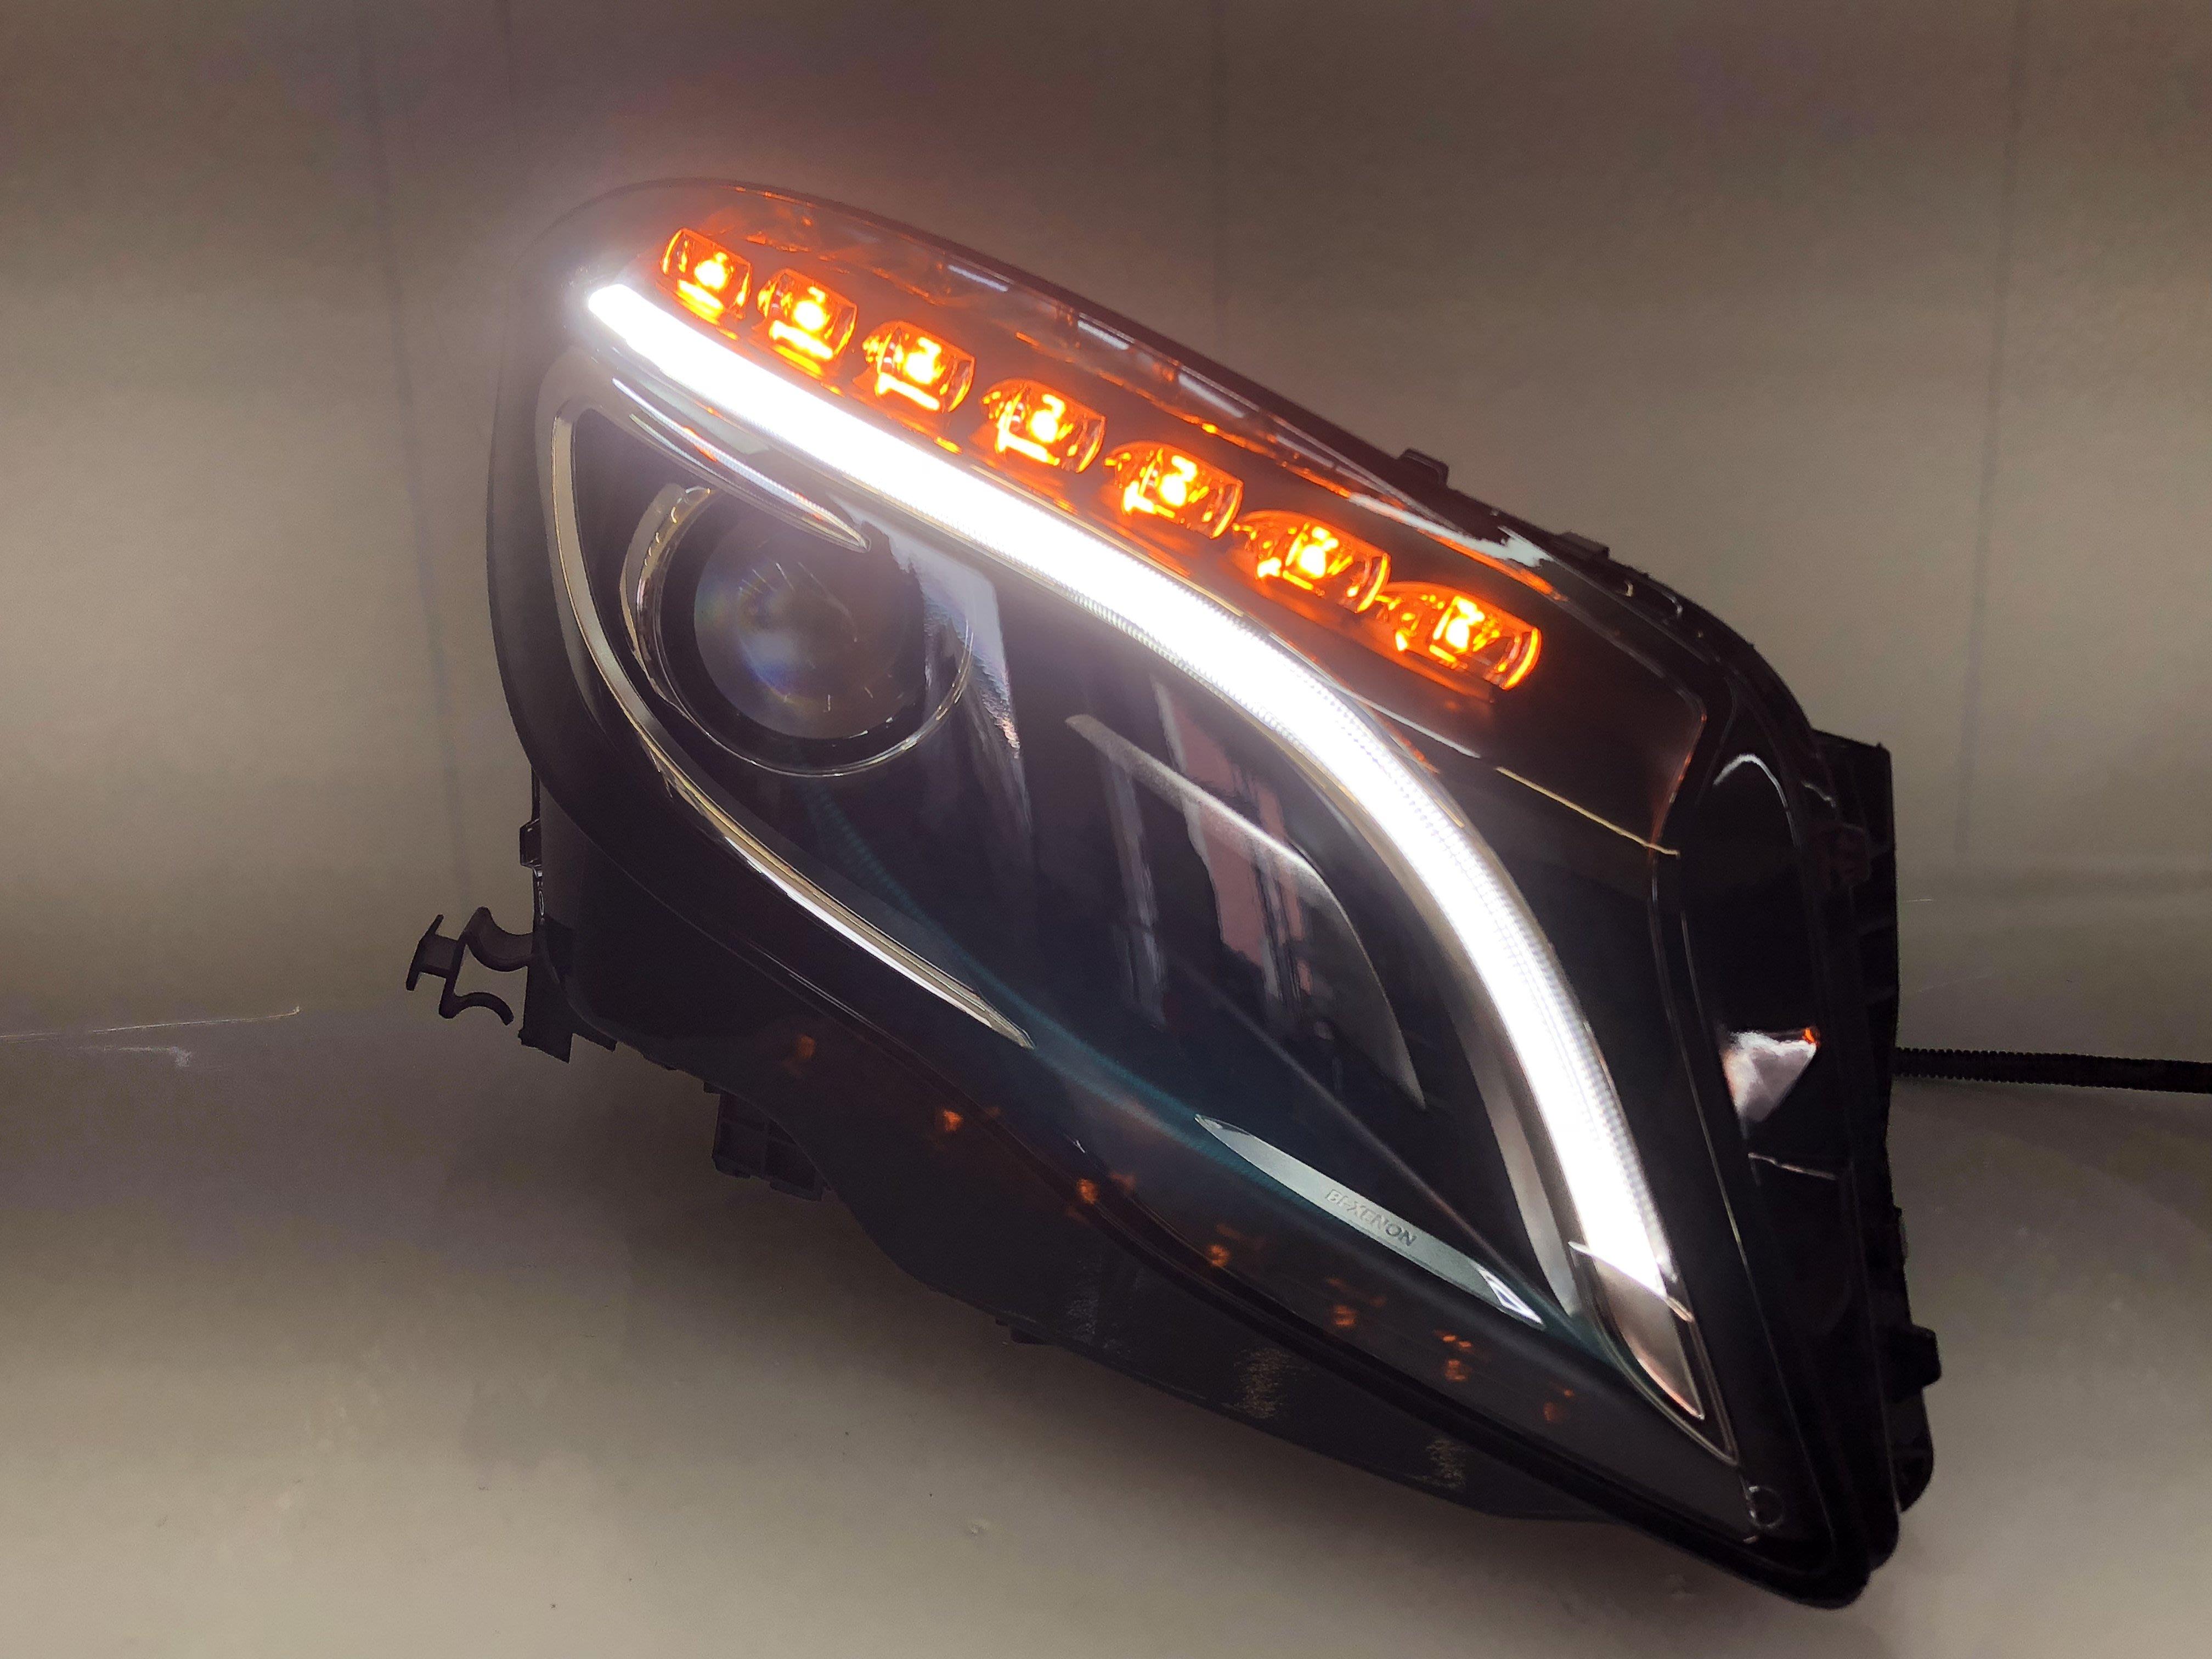 合豐源 車燈 GLA200 GLA250 GLA220 大燈 魚眼 導光 HID LED 日行燈 W156 X156